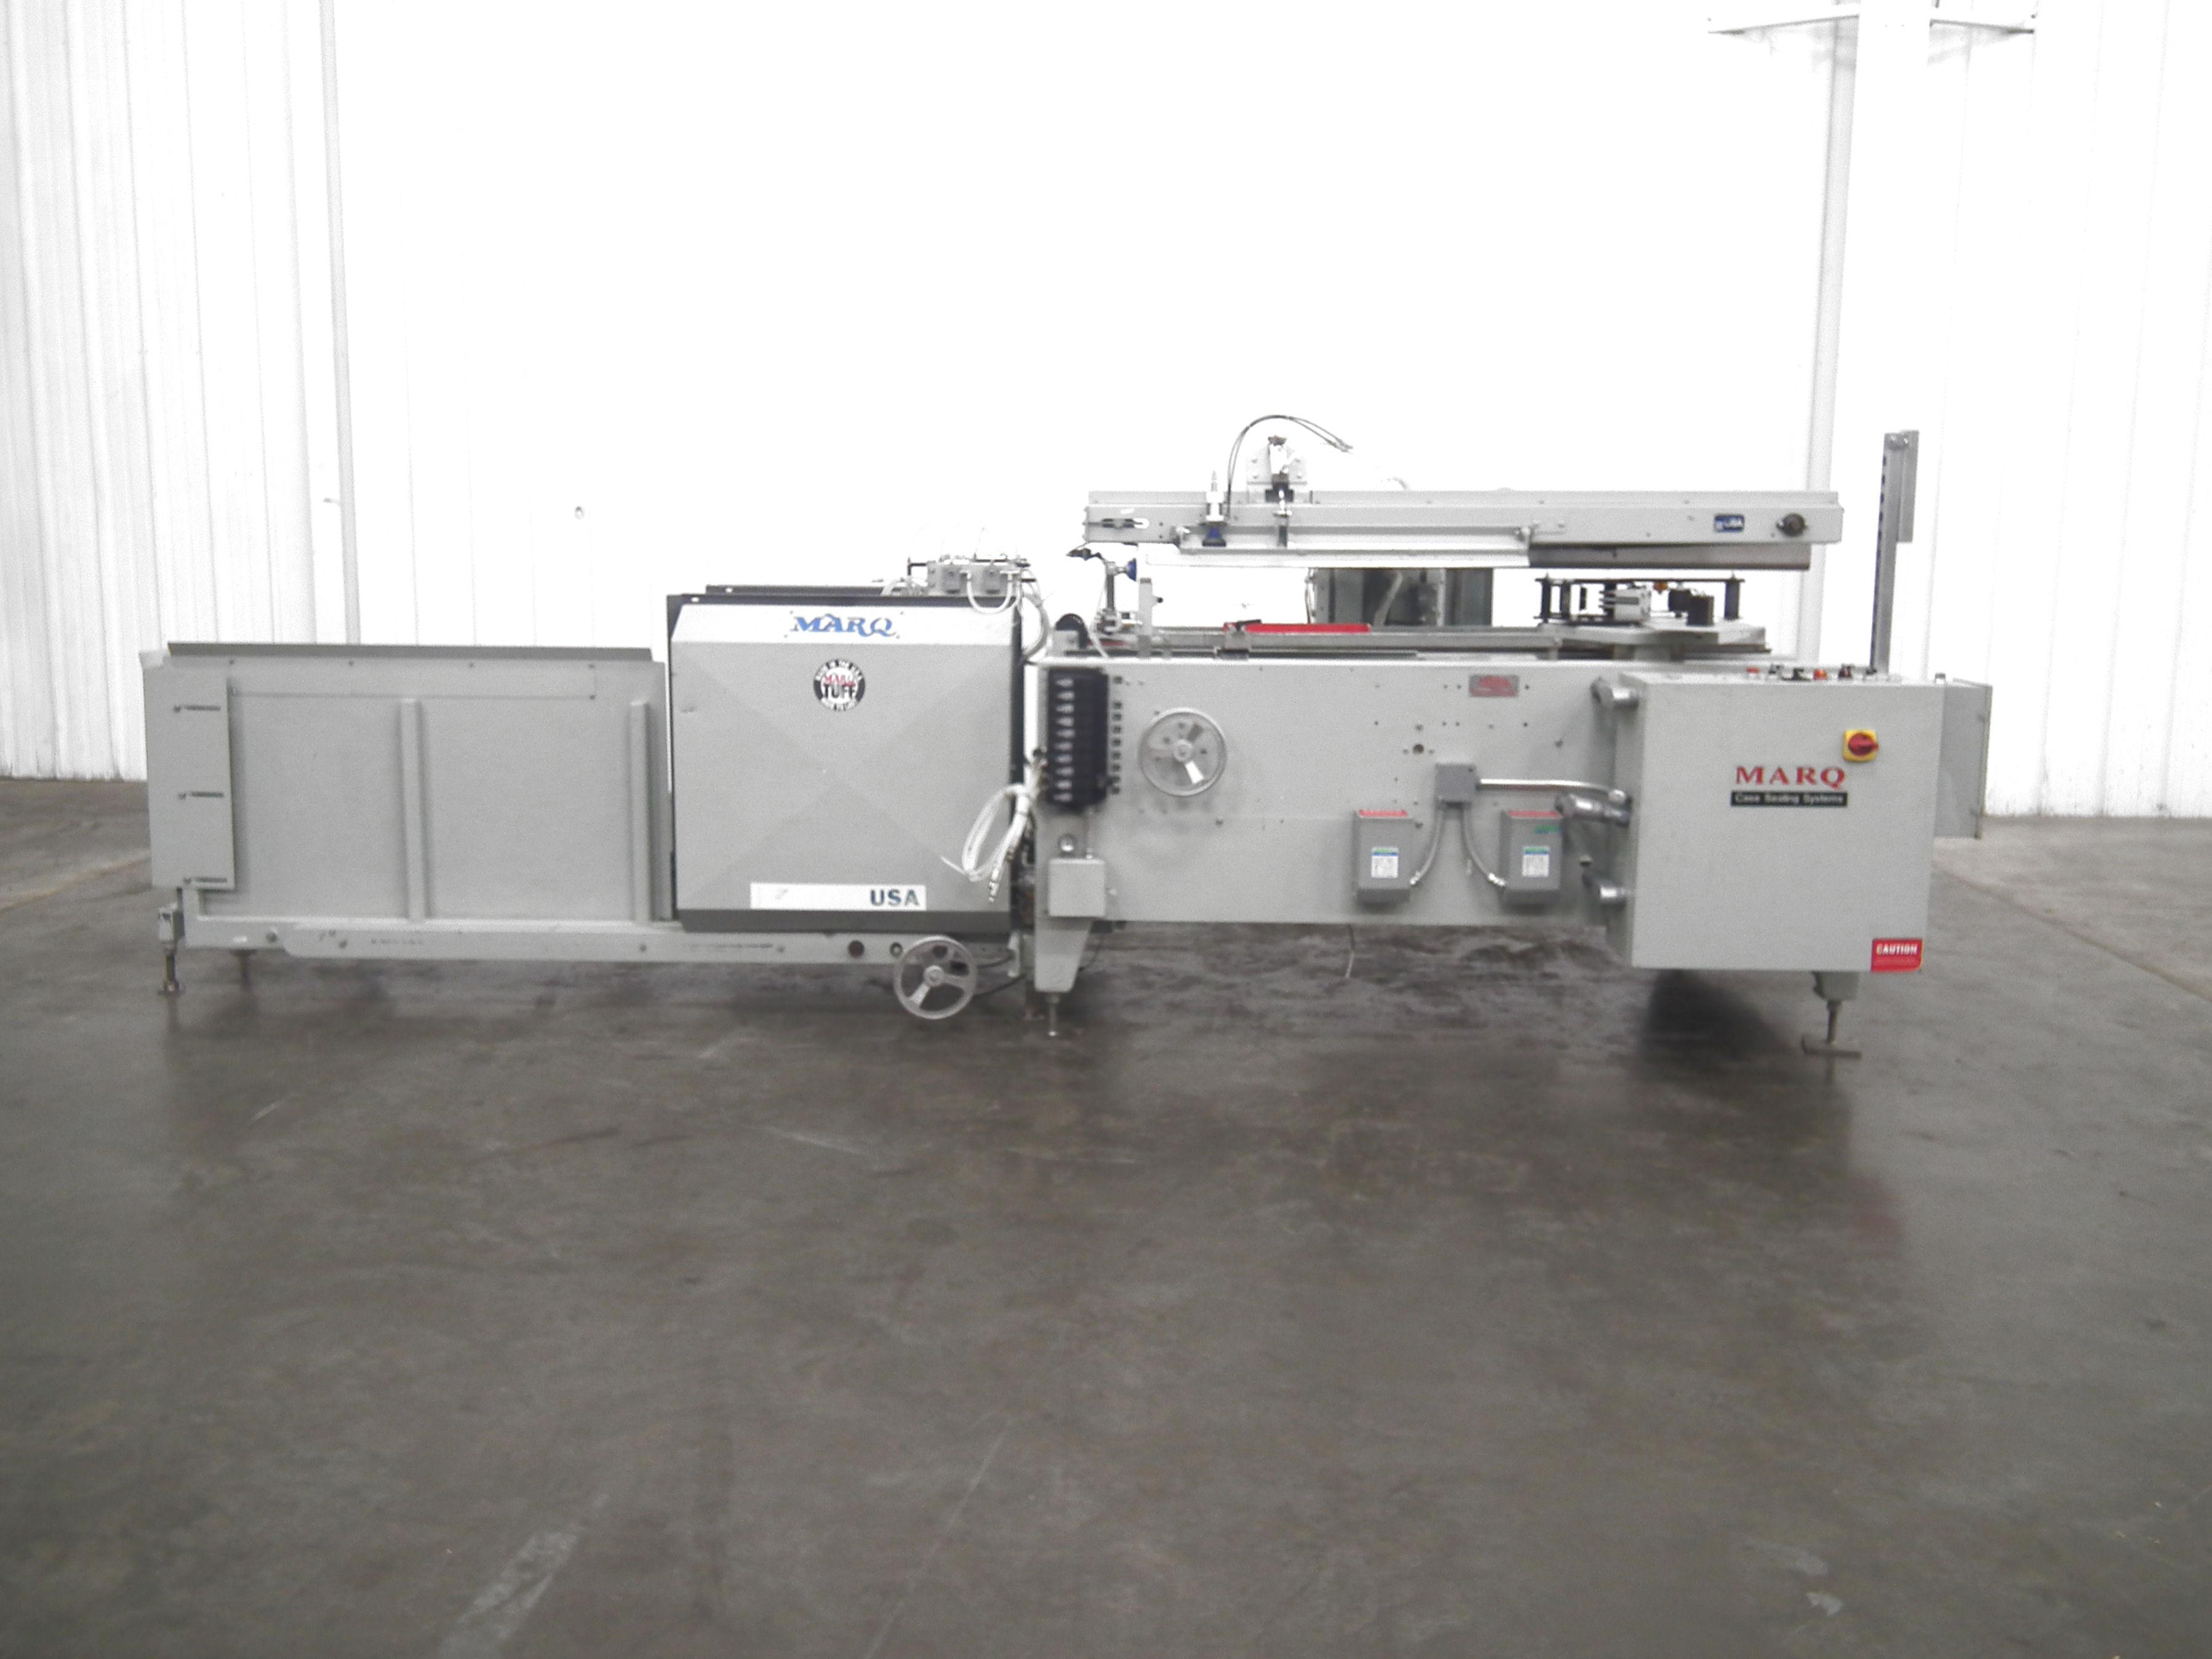 Marq Tuff HPE-NS-MF/RH/DL Bottom Tape Case Erector A9697 - Image 2 of 15